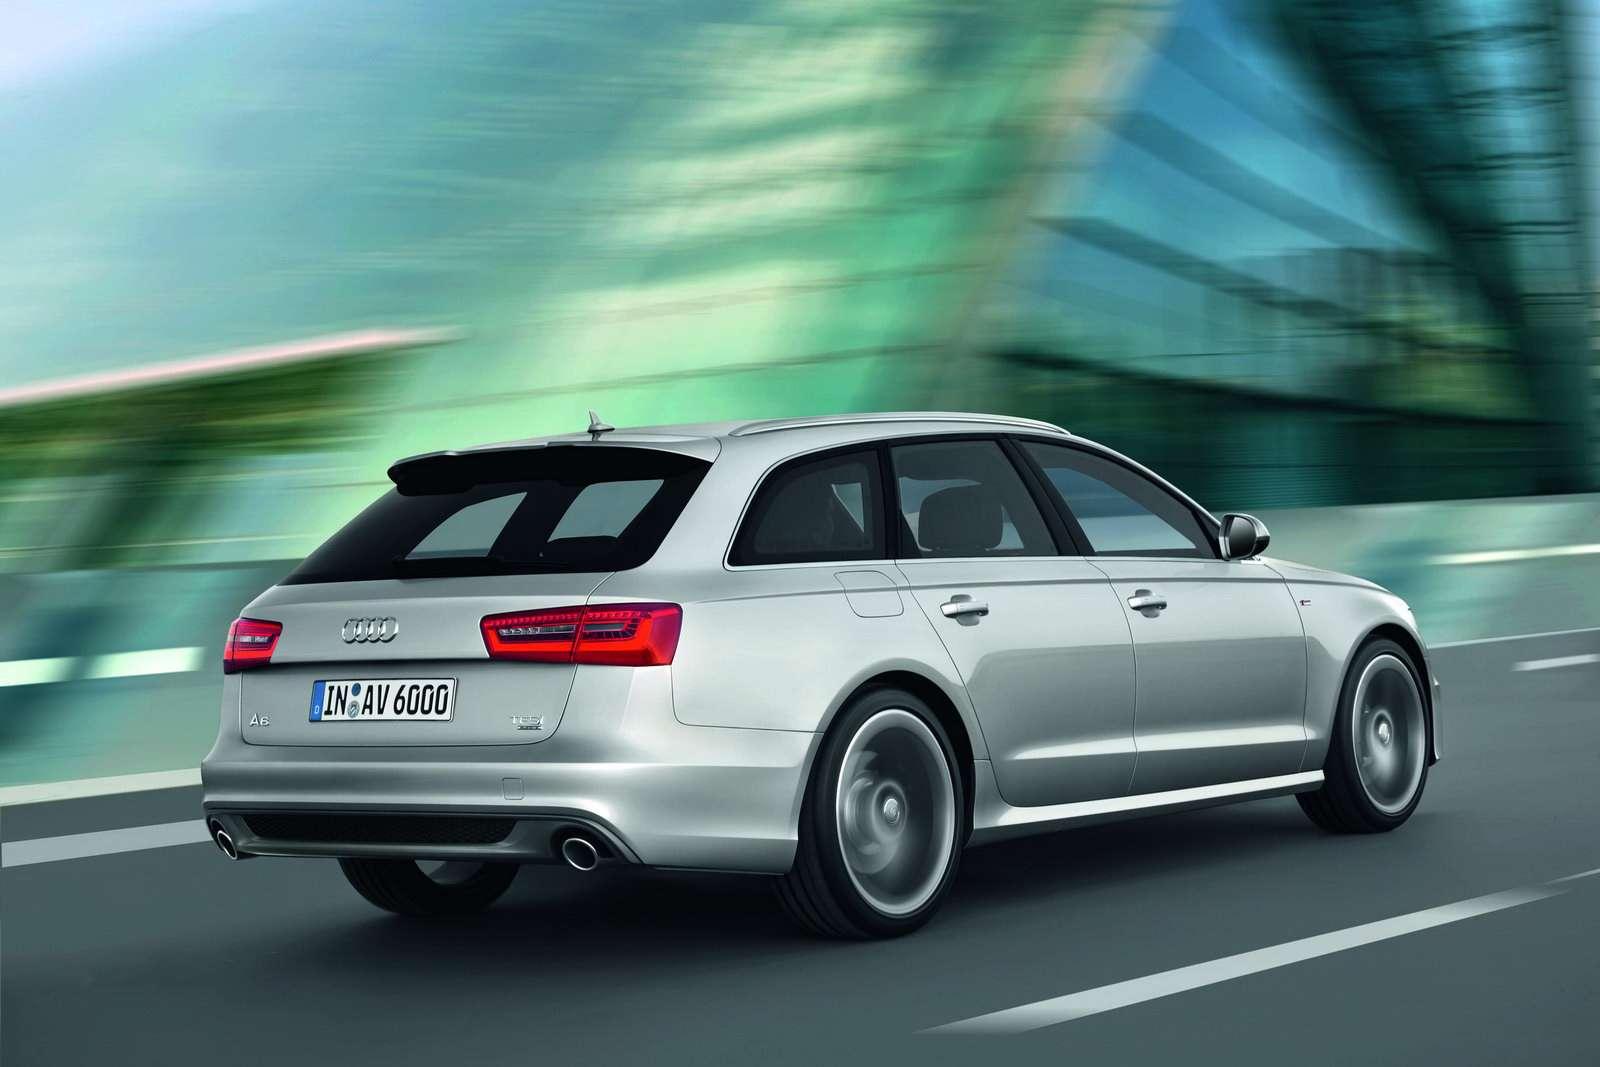 Audi A6 Avant fot maj 2011